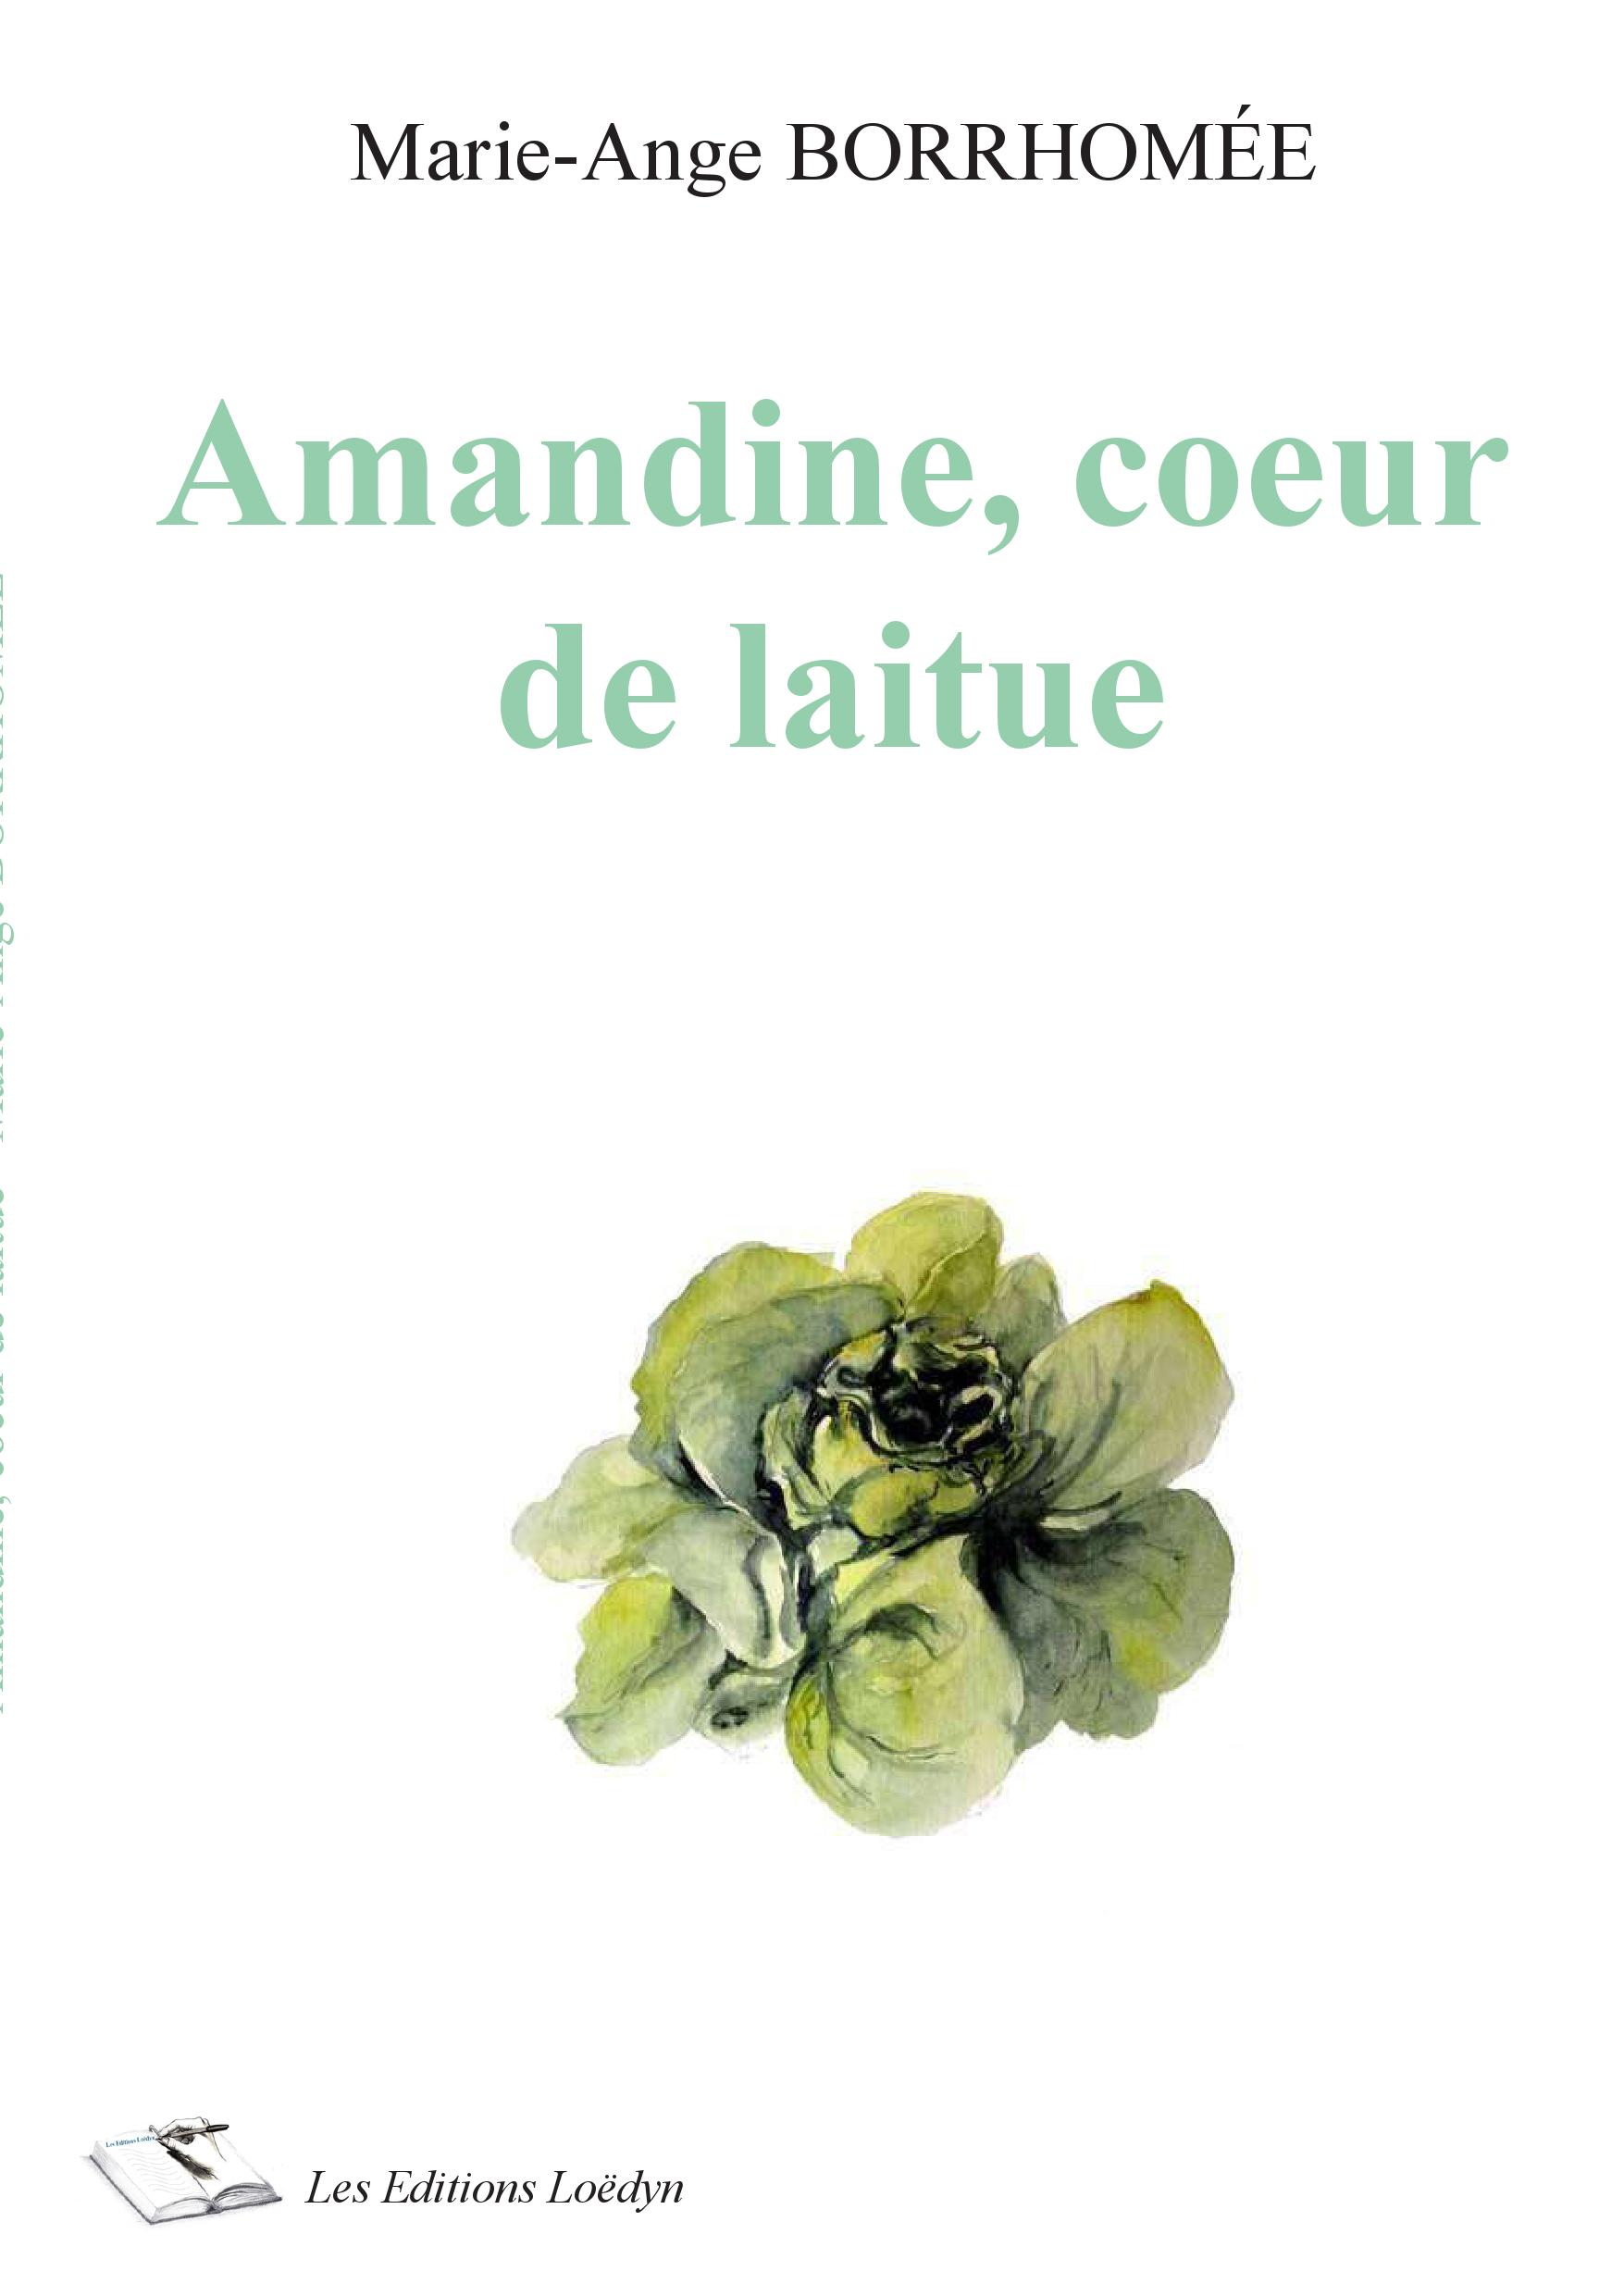 Amandine, coeur de laitue